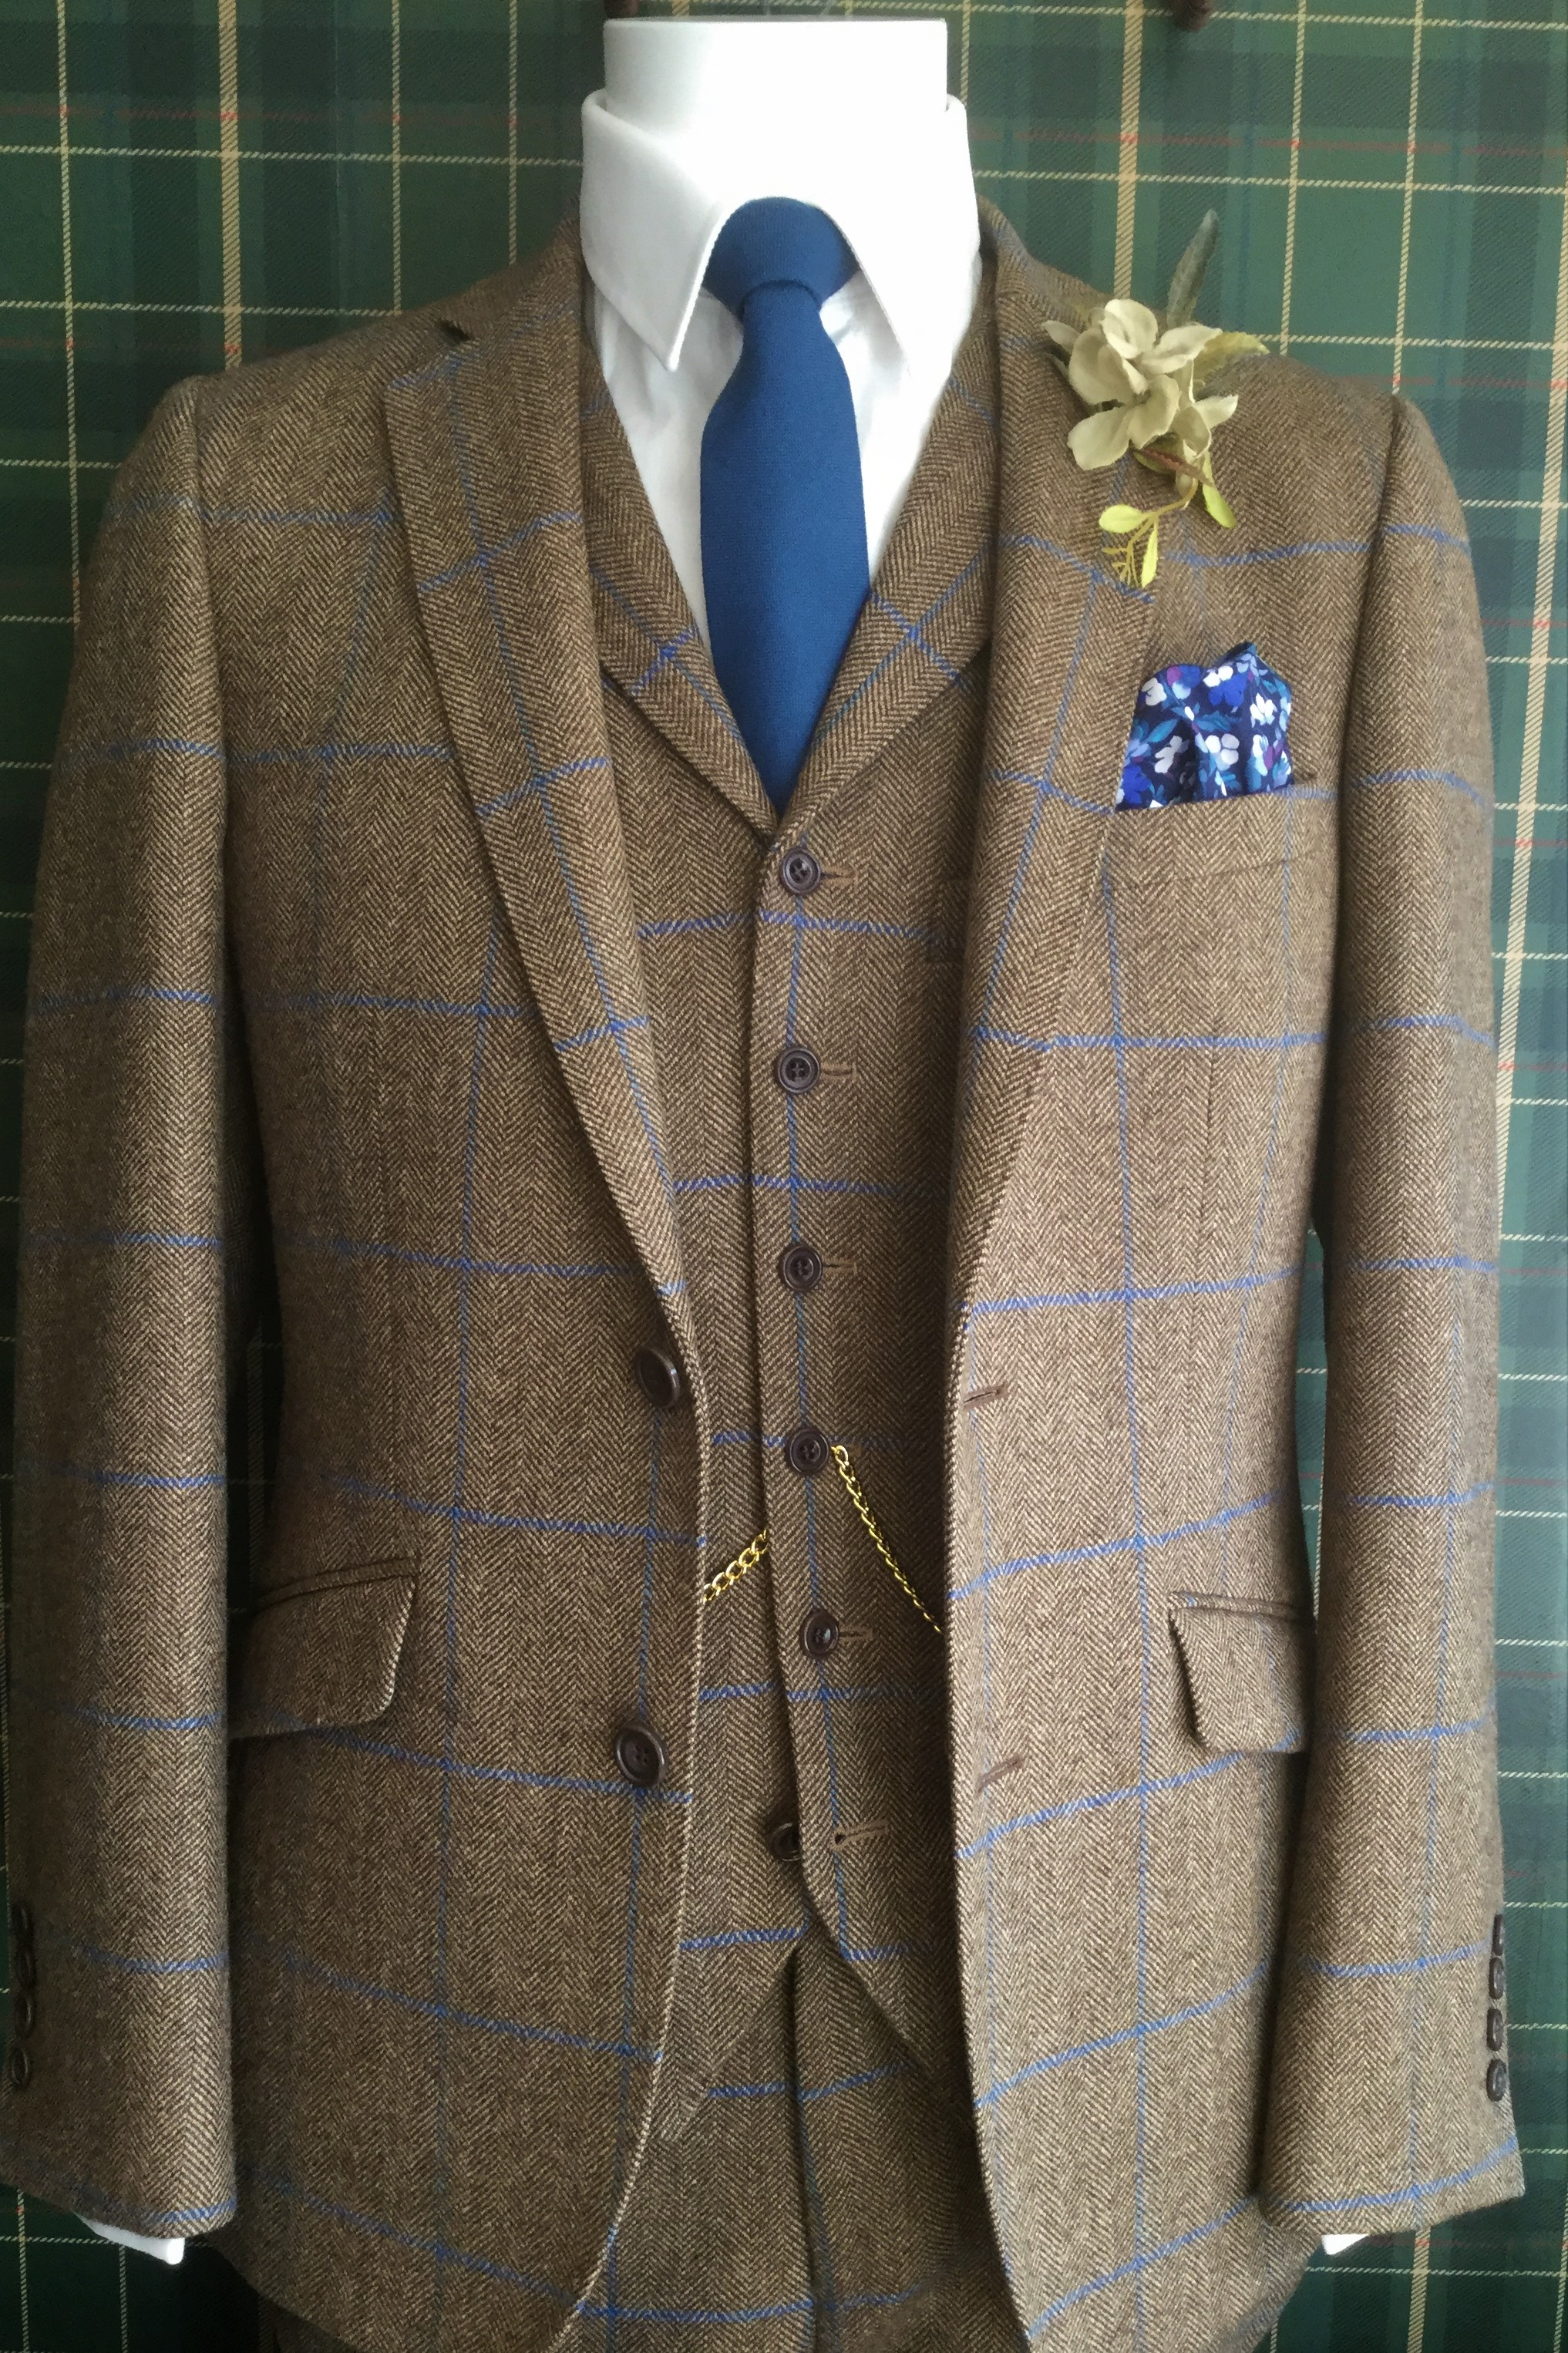 Caramel and Blue Tweed Mens Wedding Suit with navy tie and handkerchief, by Black Tie Menswear, Berkshire